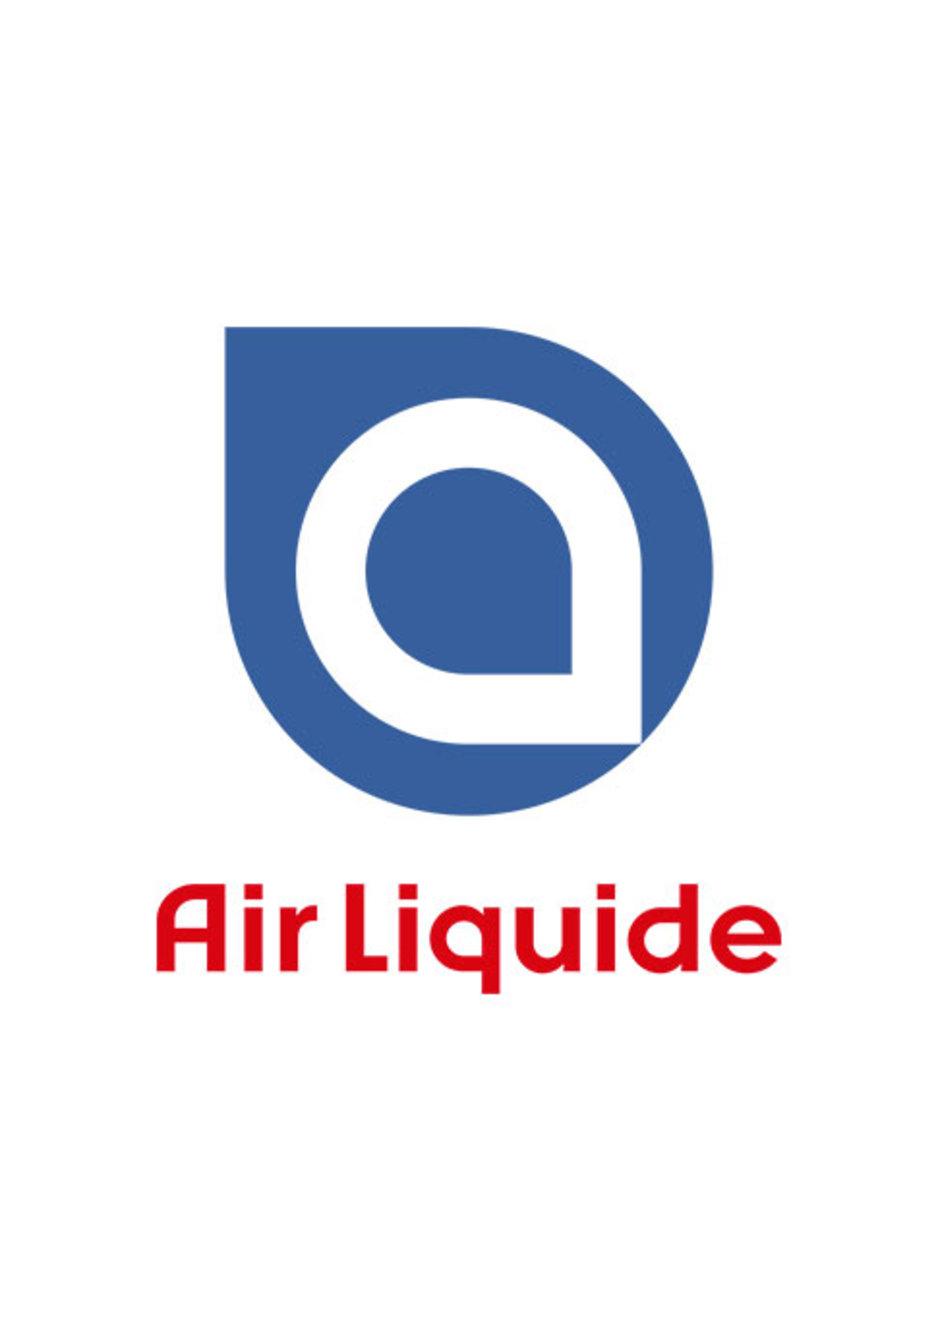 logo de AIR LIQUIDE